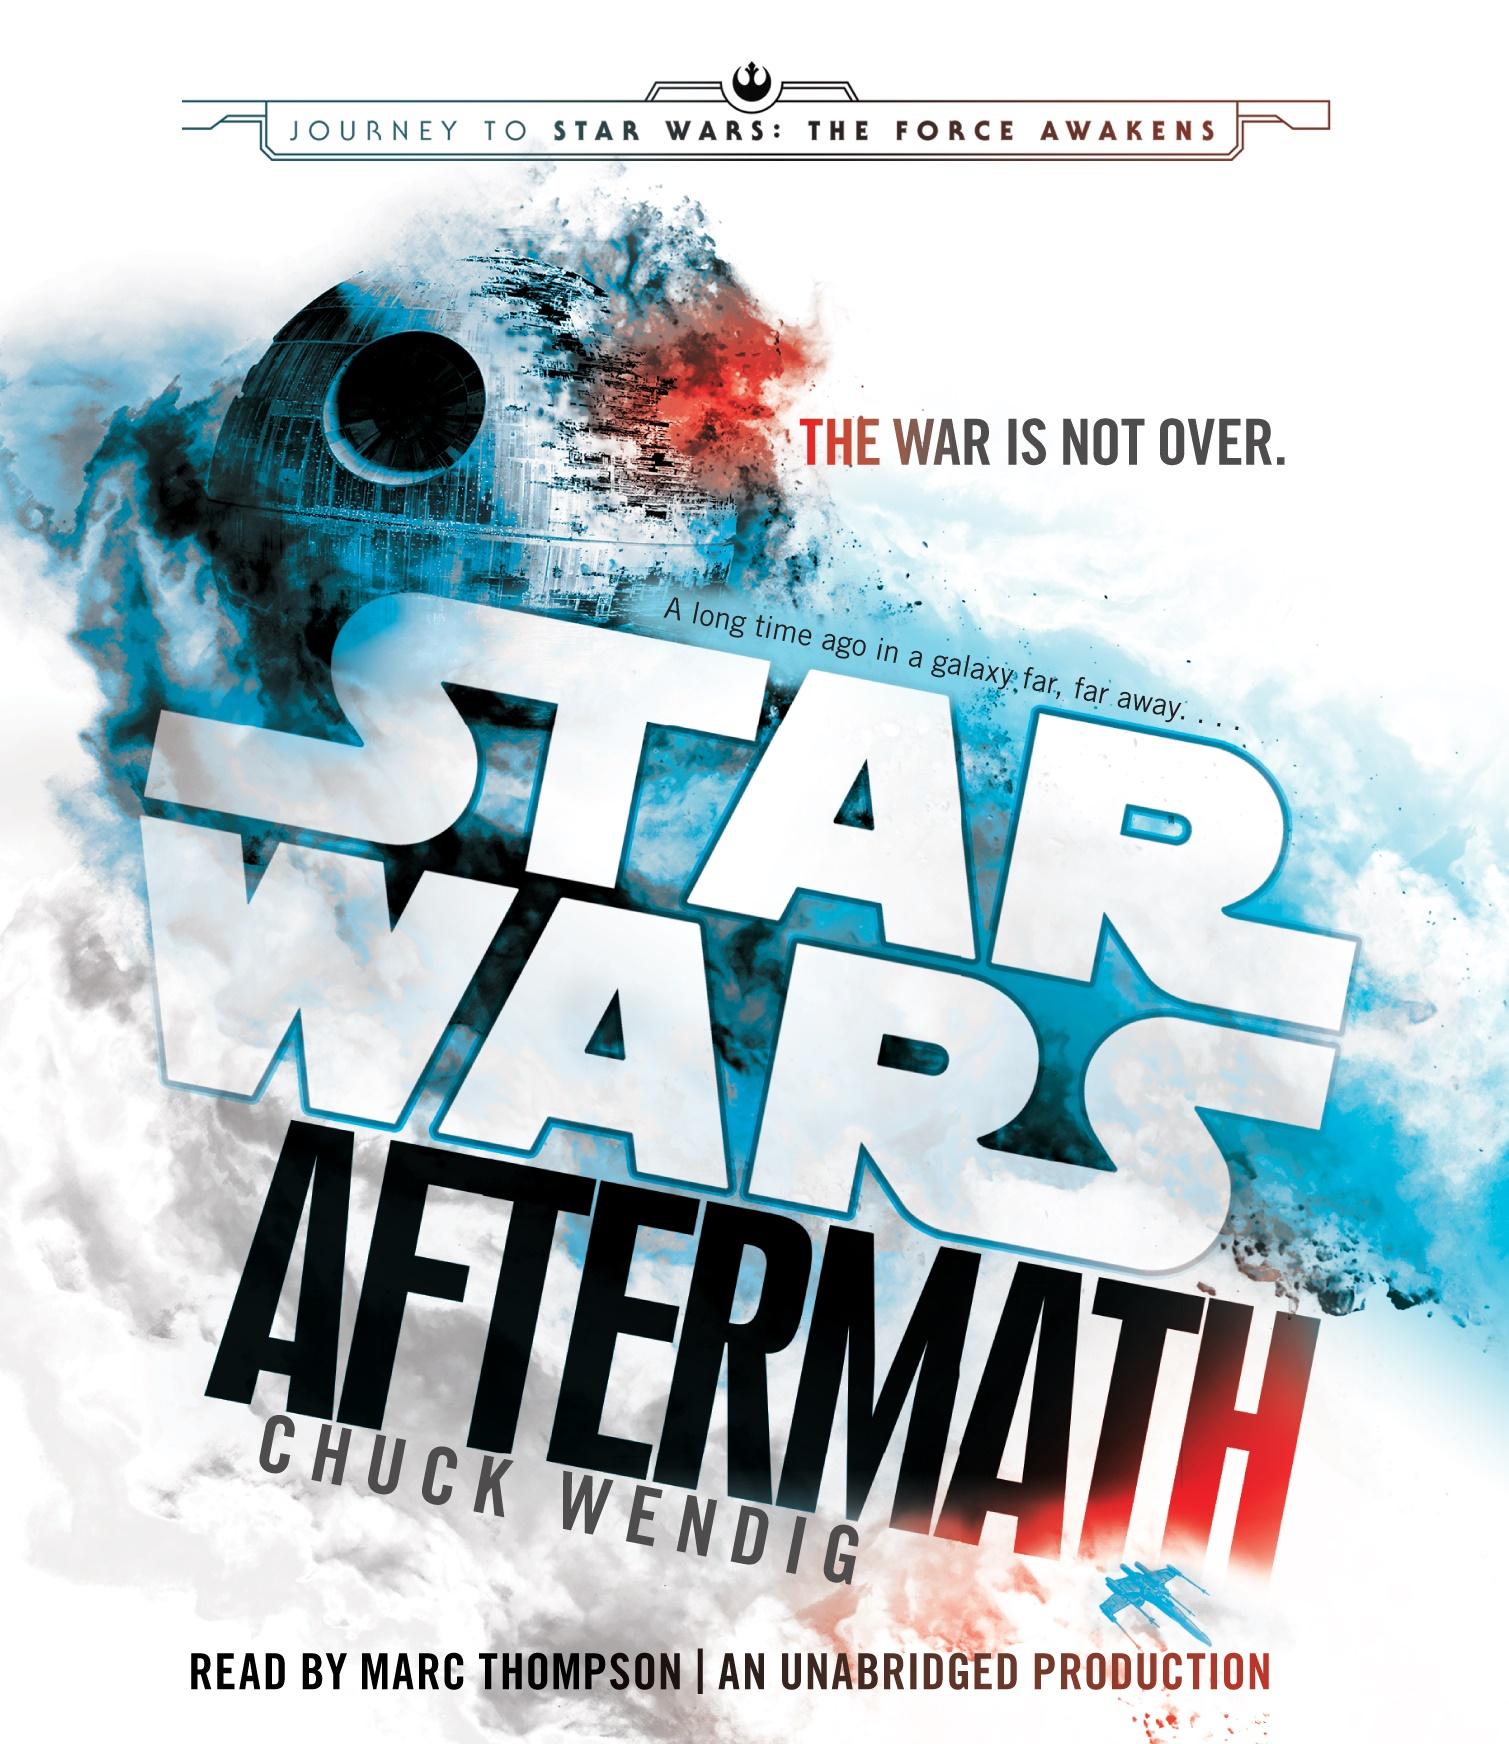 star wars audio books release dates